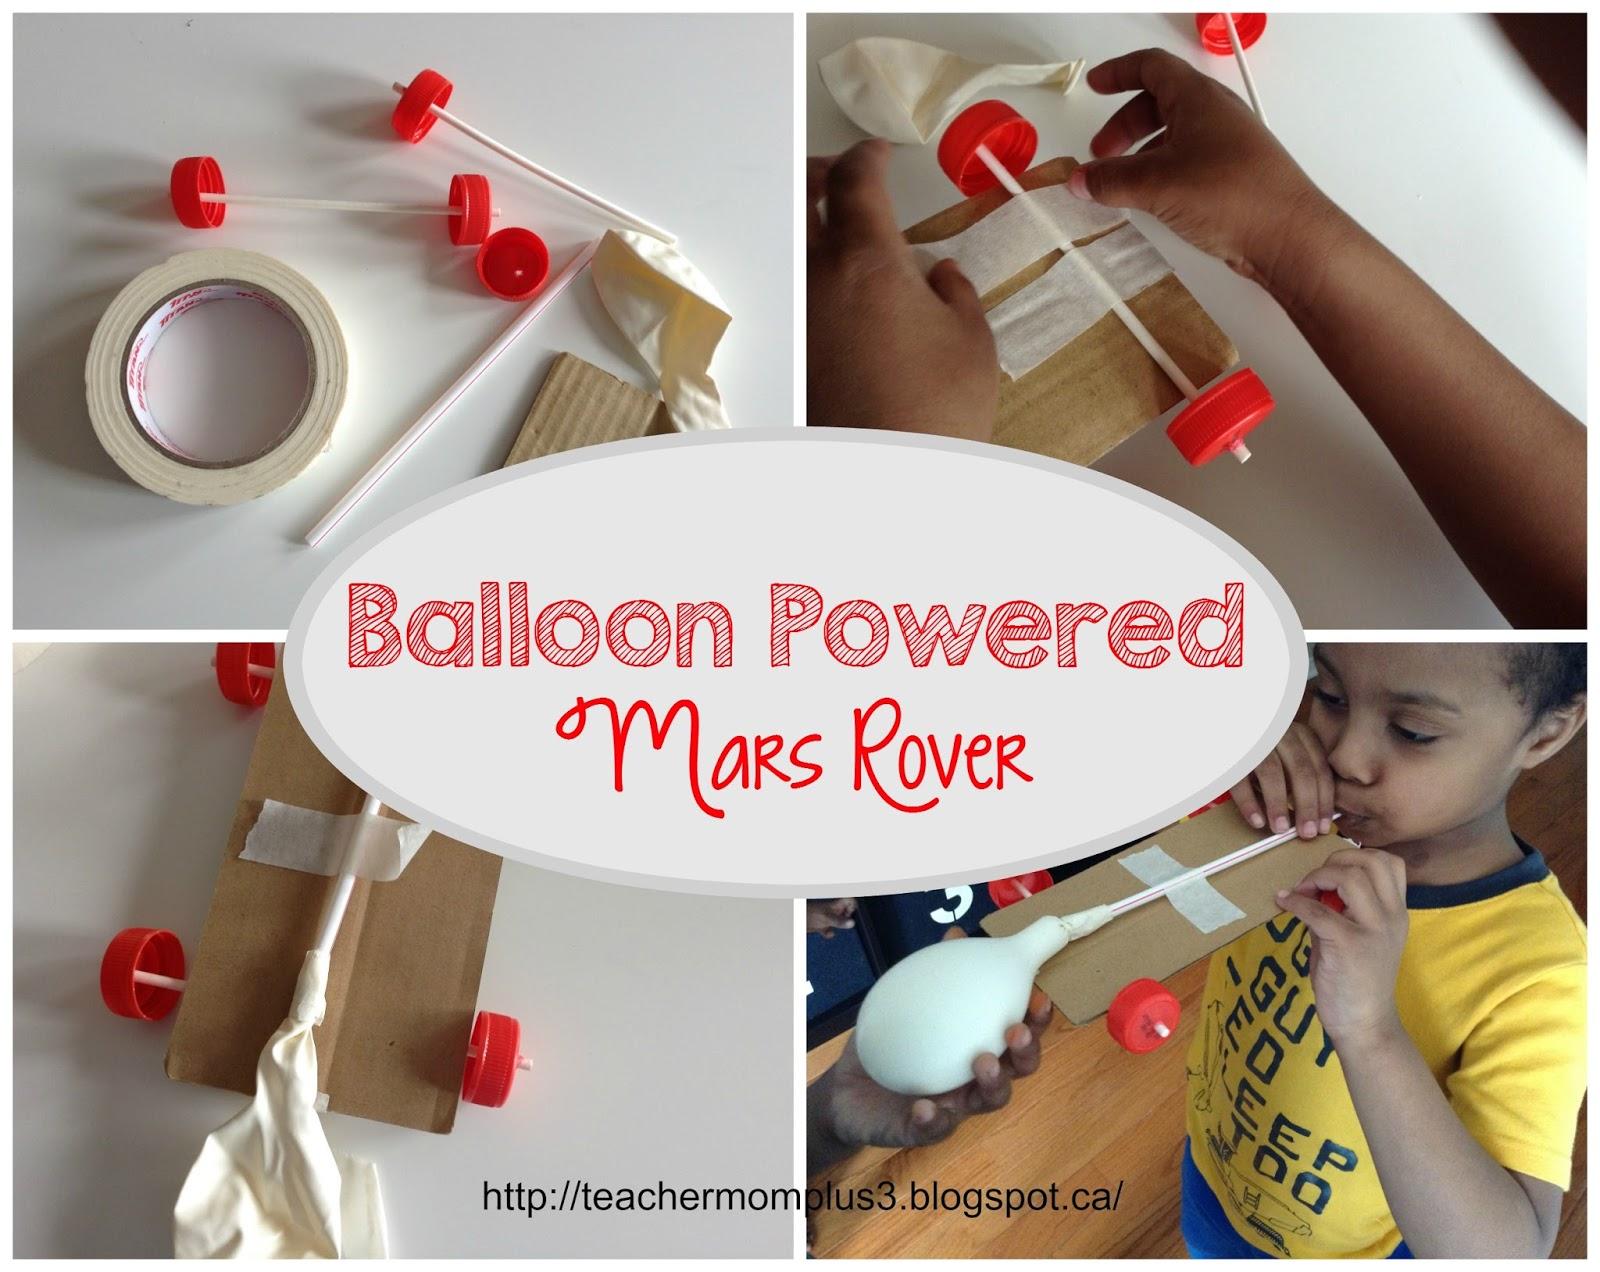 mars rover balloons - photo #6